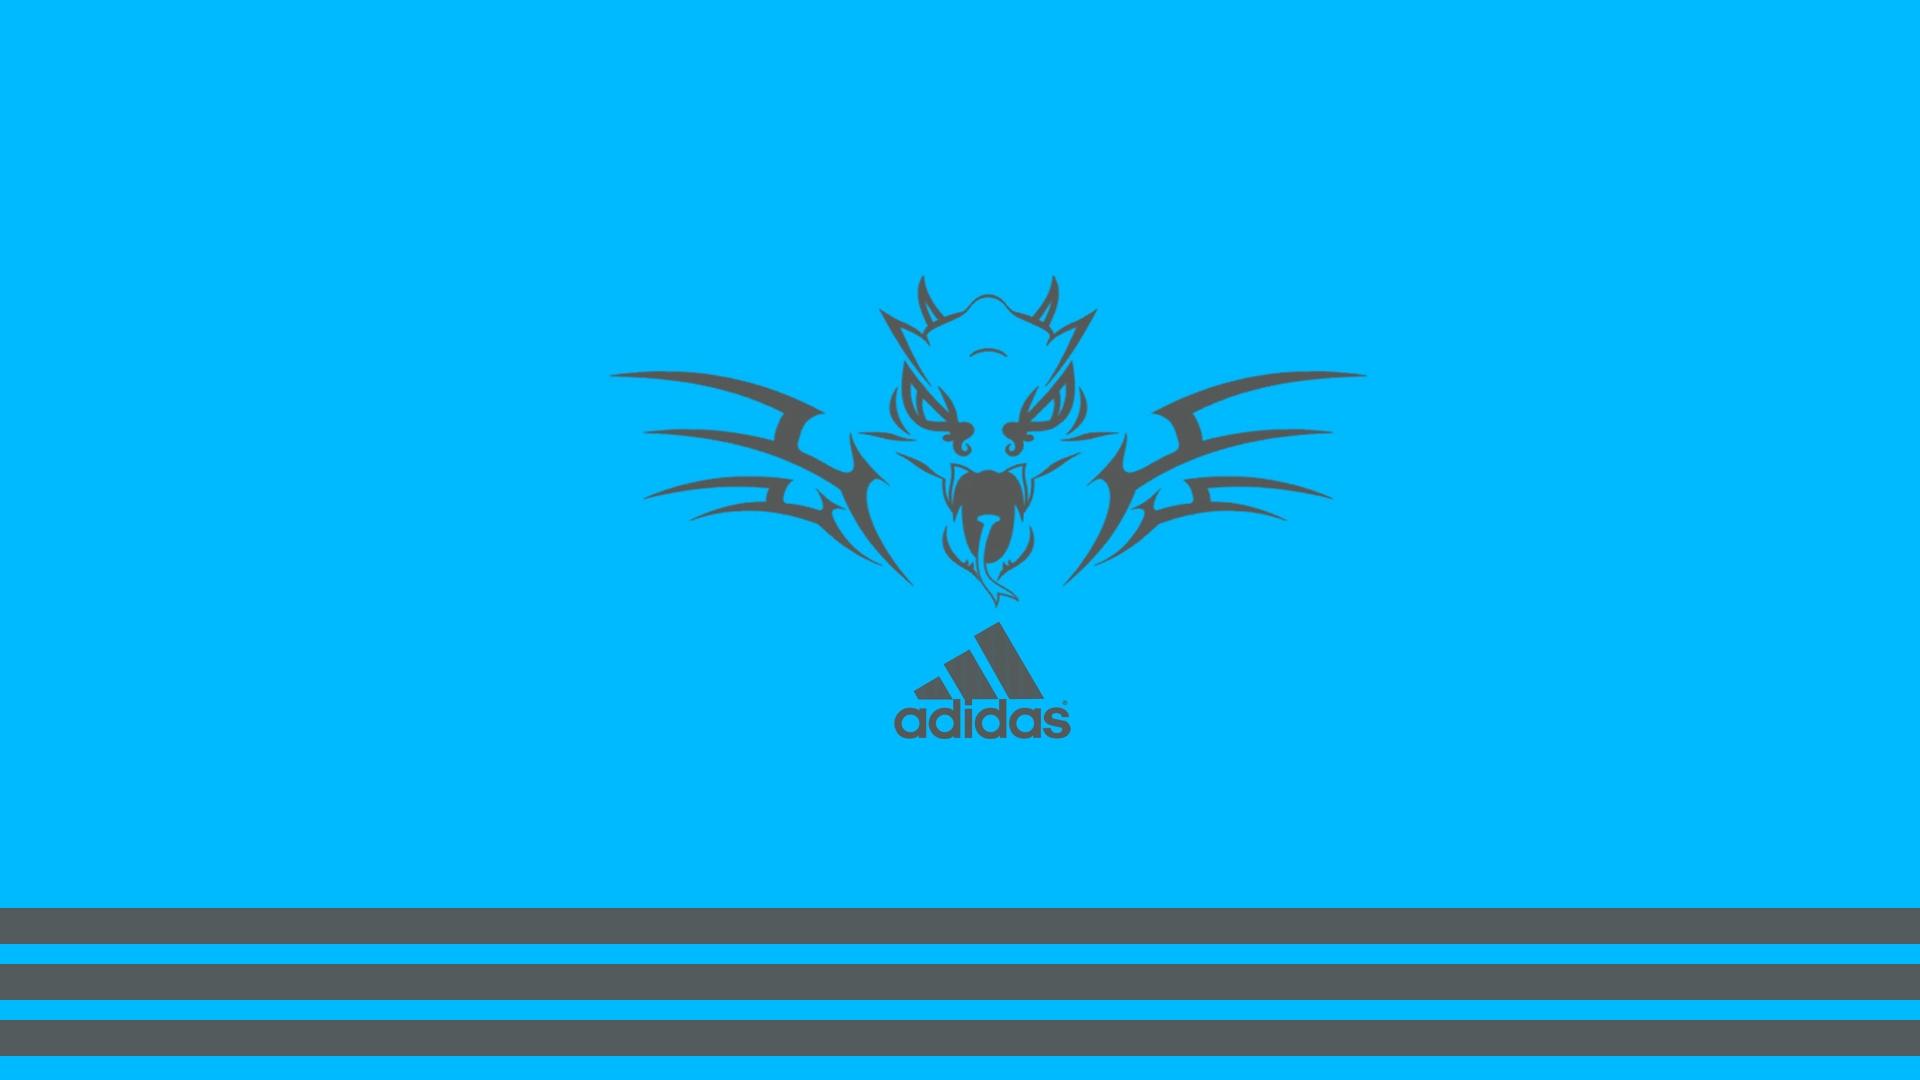 Adidas Wallpaper